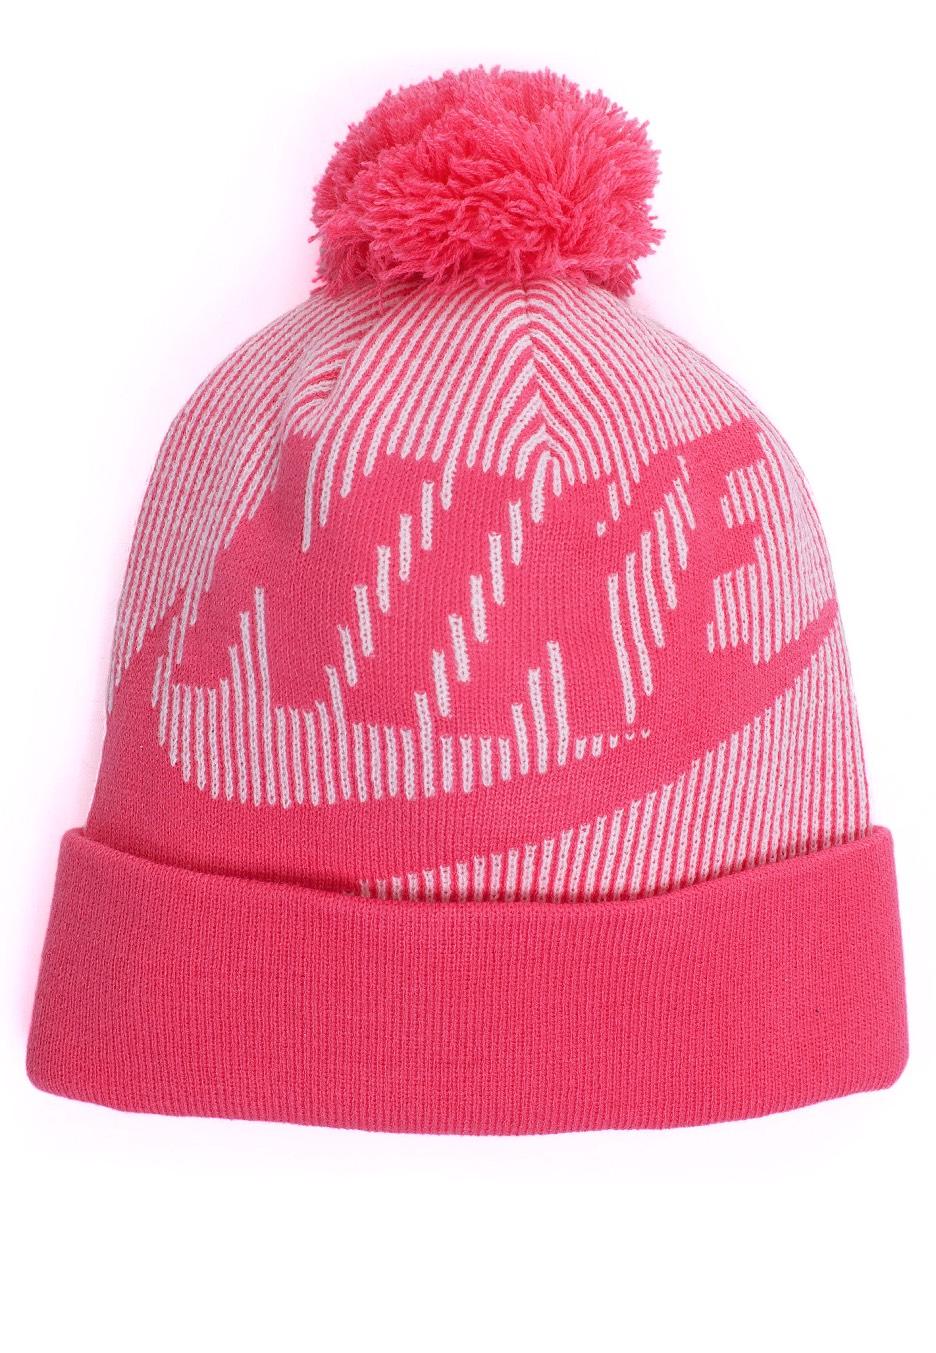 Nike - NSW Blue Pink Nebula White Pink Nebula - Beanie - Streetwear ... f6c5f9ab14c